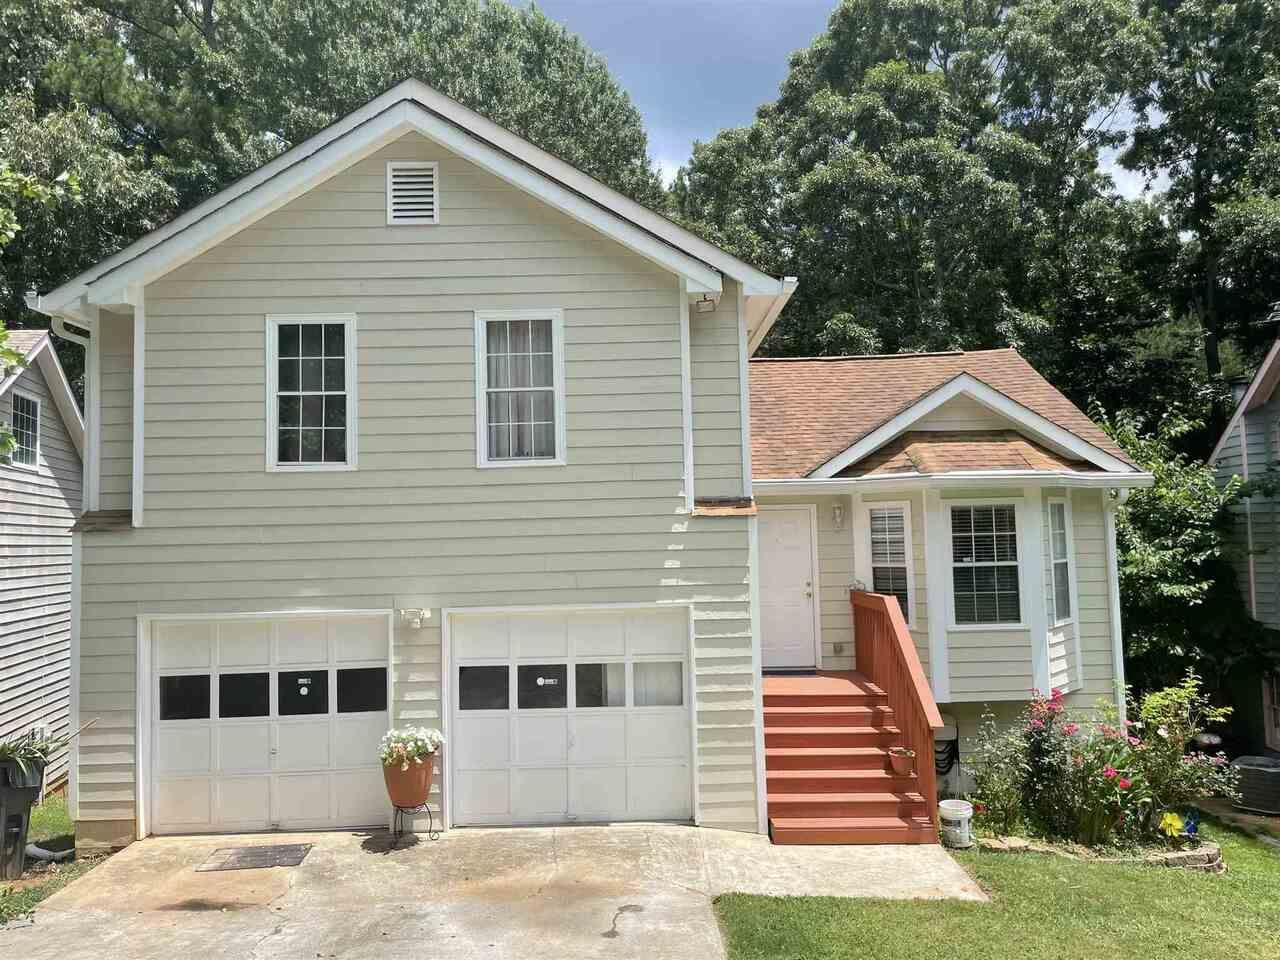 1710 Eleah Drive, Lawrenceville, GA 30044 - #: 9019908